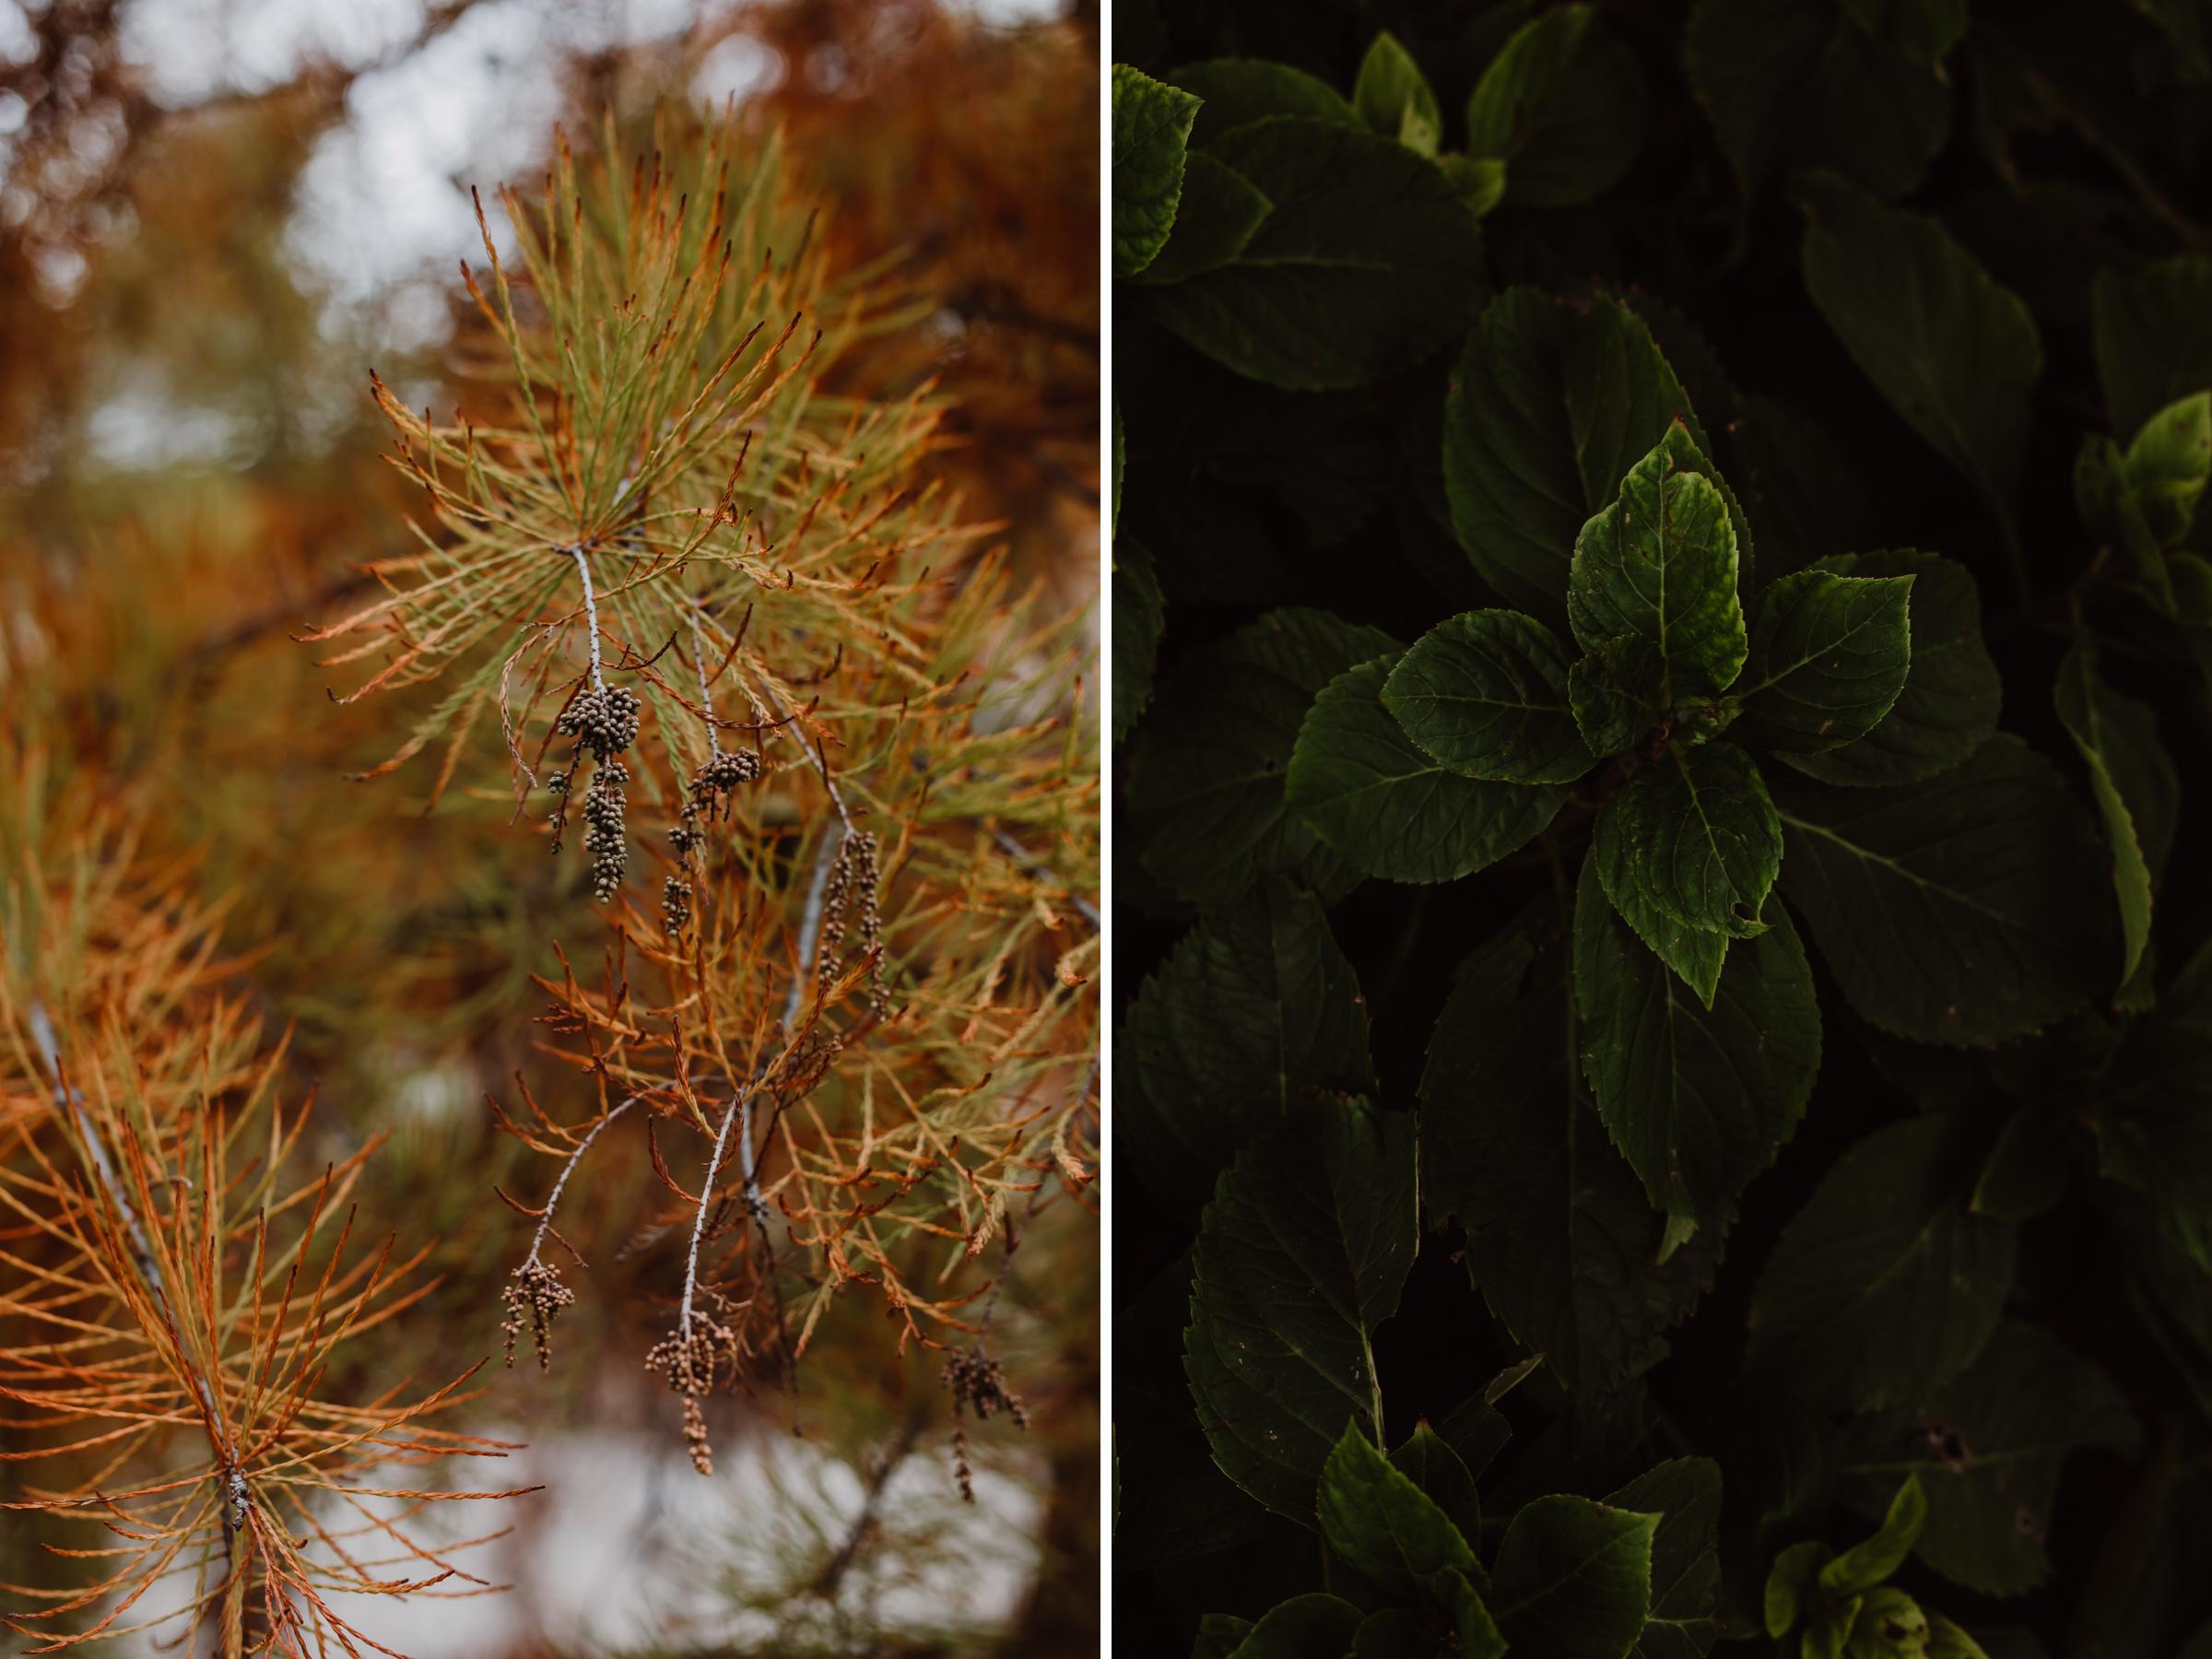 ftworth-botanical-garden-1.jpg